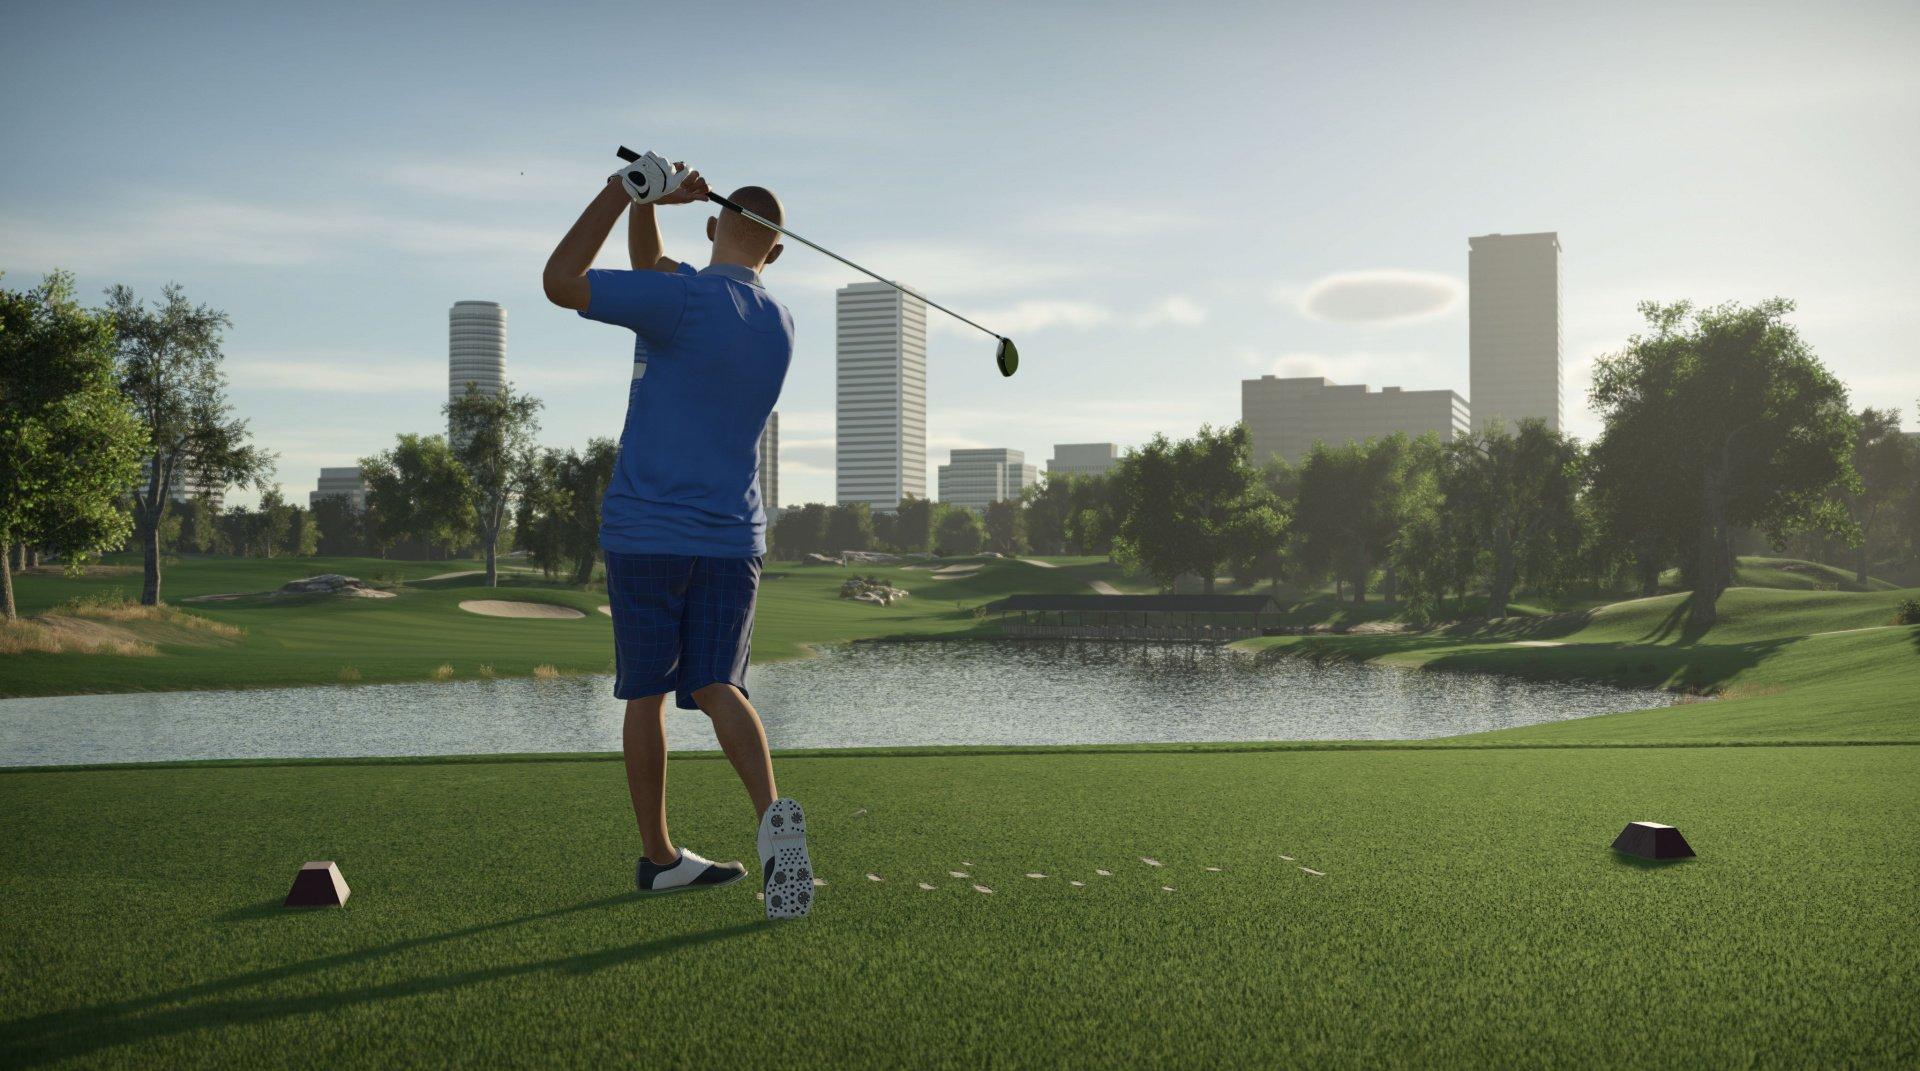 the golf club 2 ps4 playstation 4 news reviews trailer screenshots. Black Bedroom Furniture Sets. Home Design Ideas